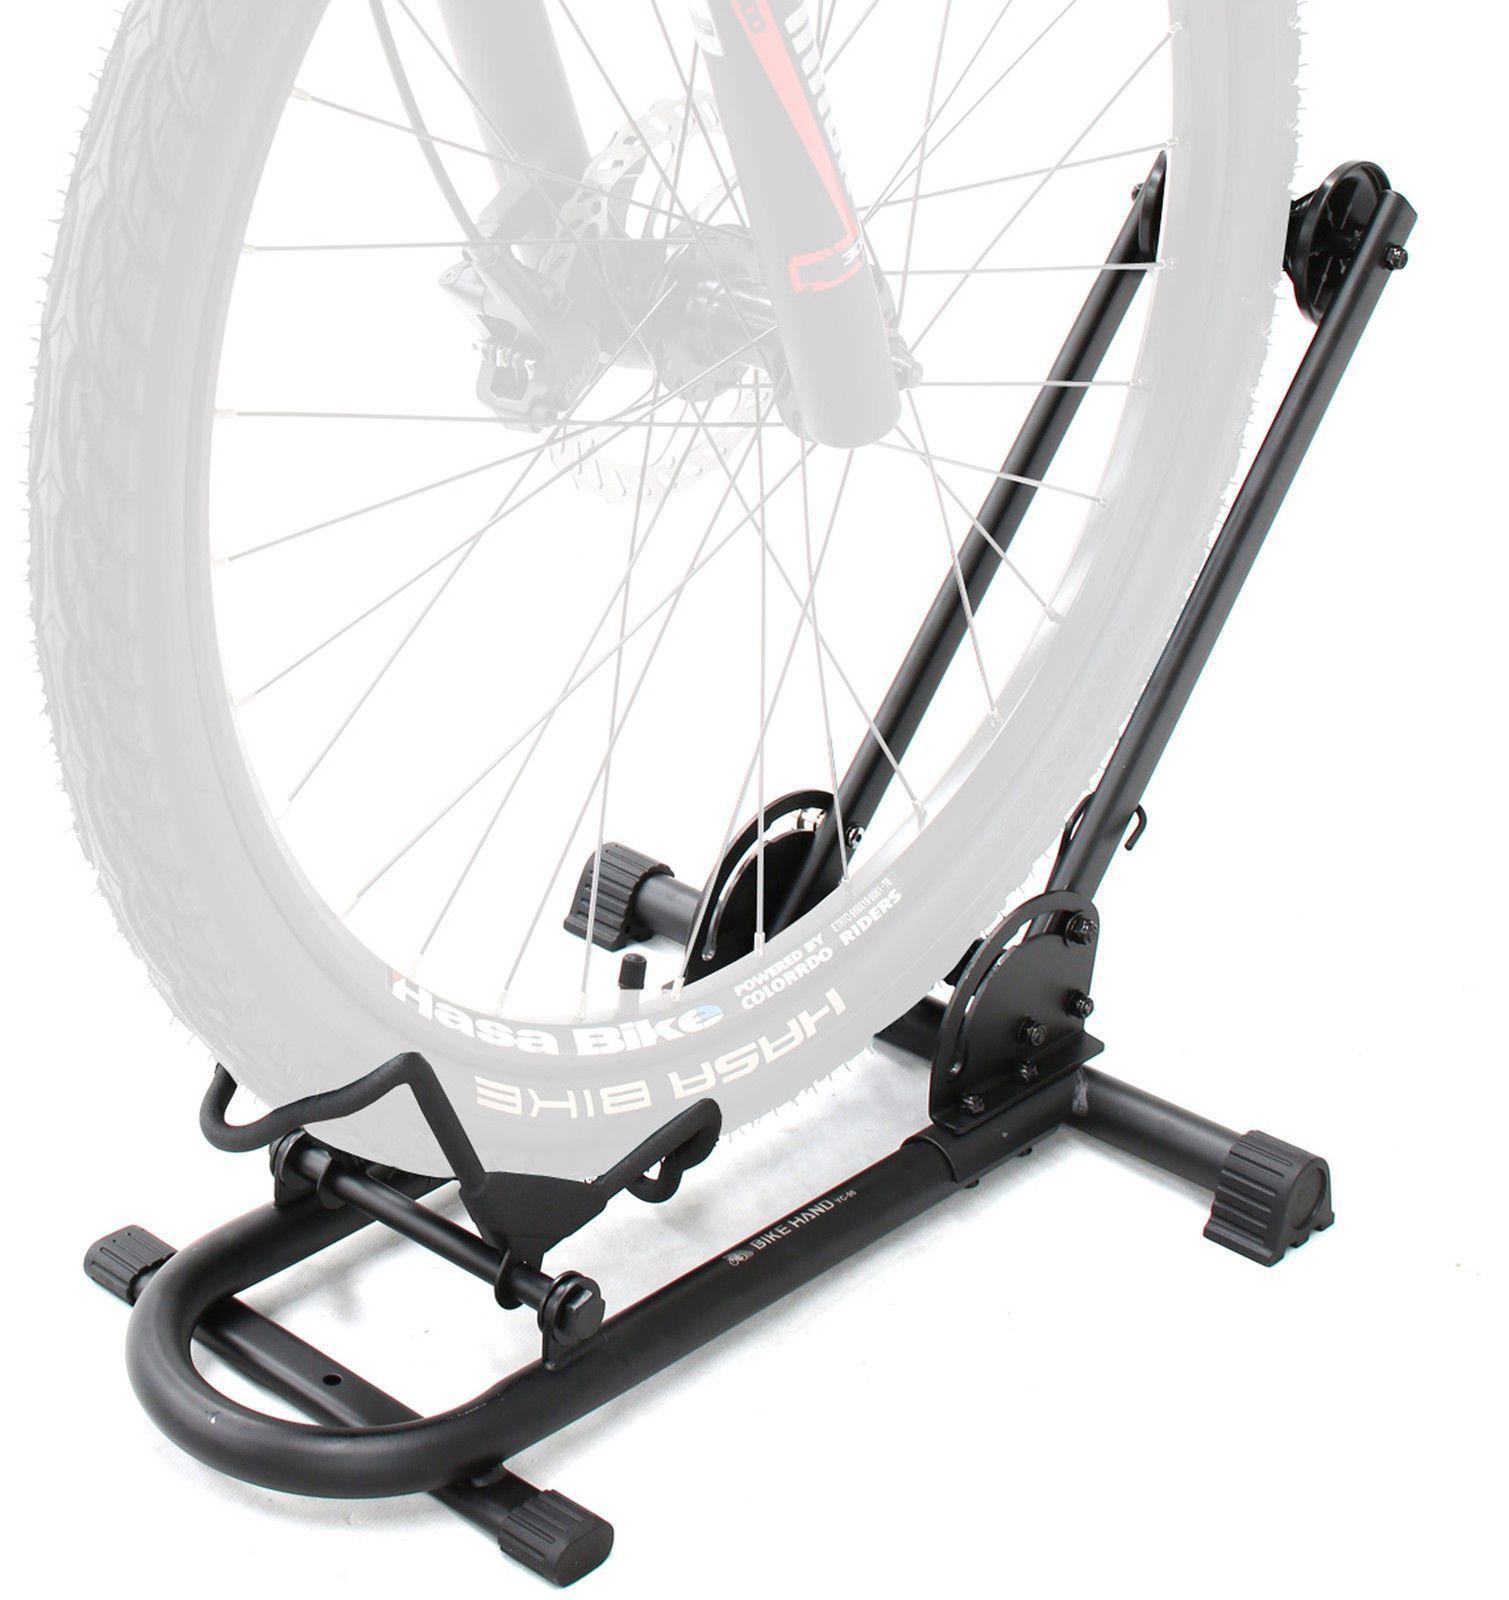 BIKEHAND Bike Floor Parking Rack Storage Stand Bicycle